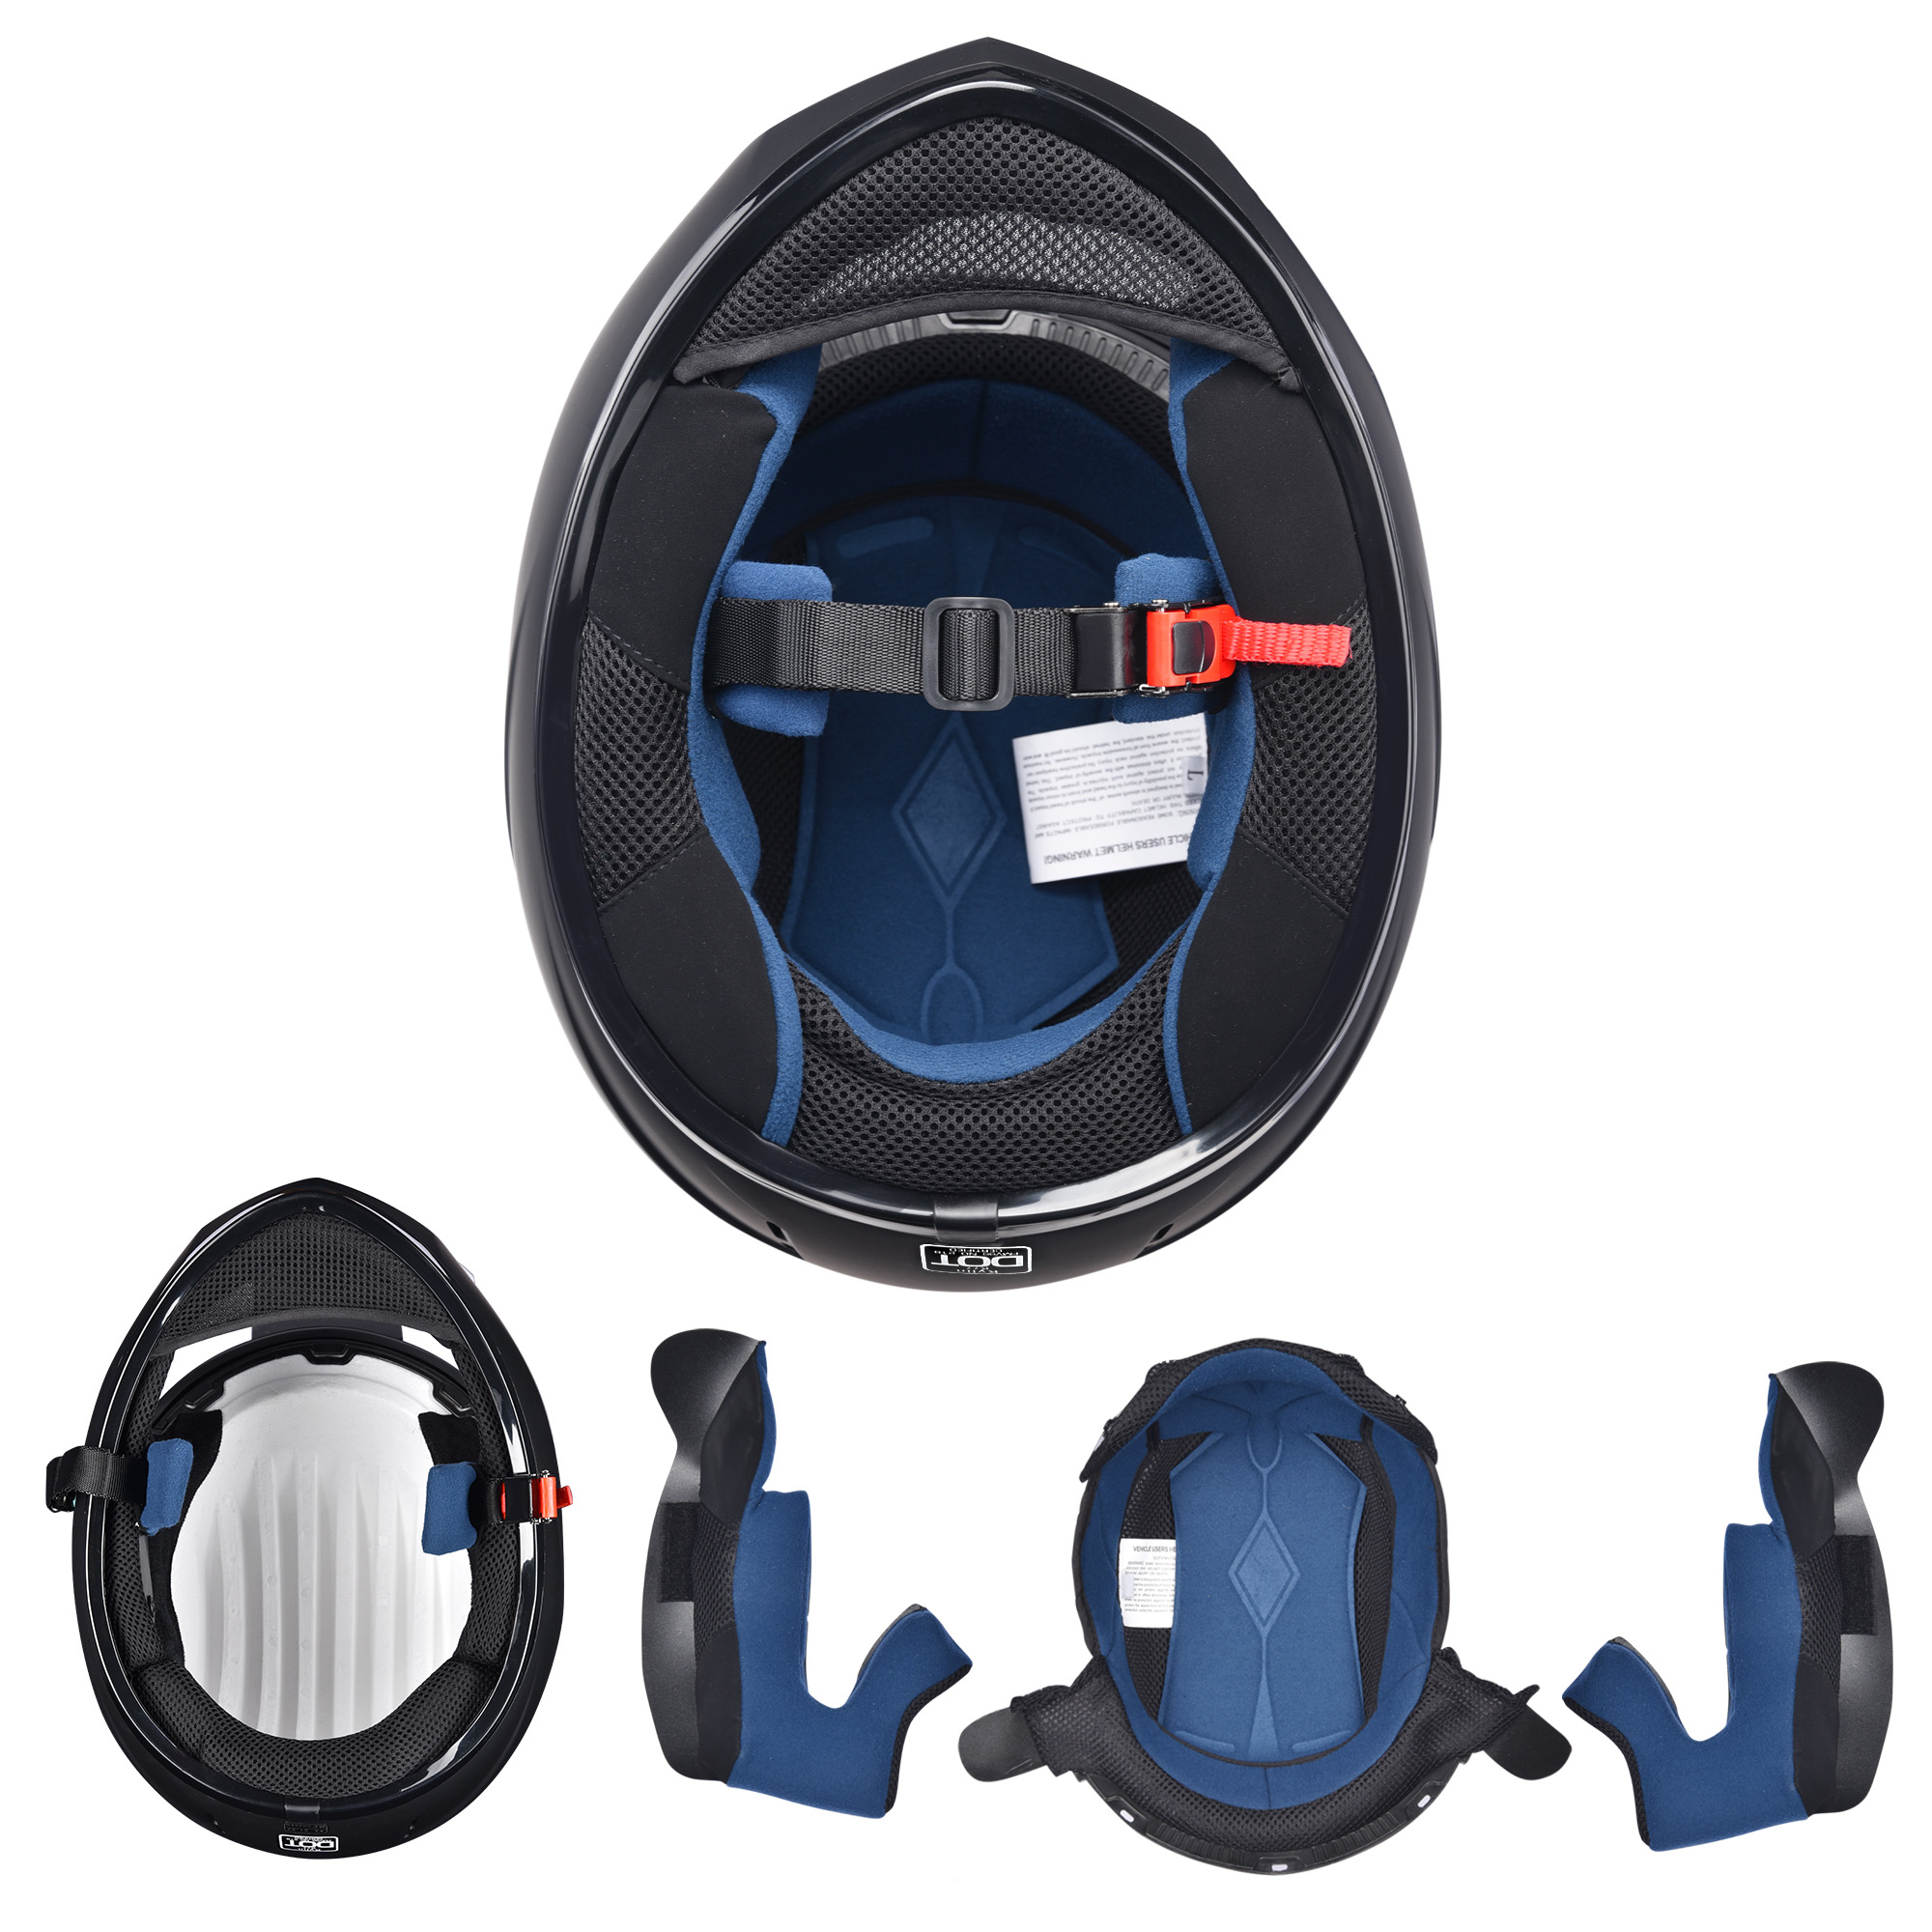 miniature 140 - AHR K12 Full Face Motorcycle Helmet DOT Air Vents Clear Visor Racing S M L XL